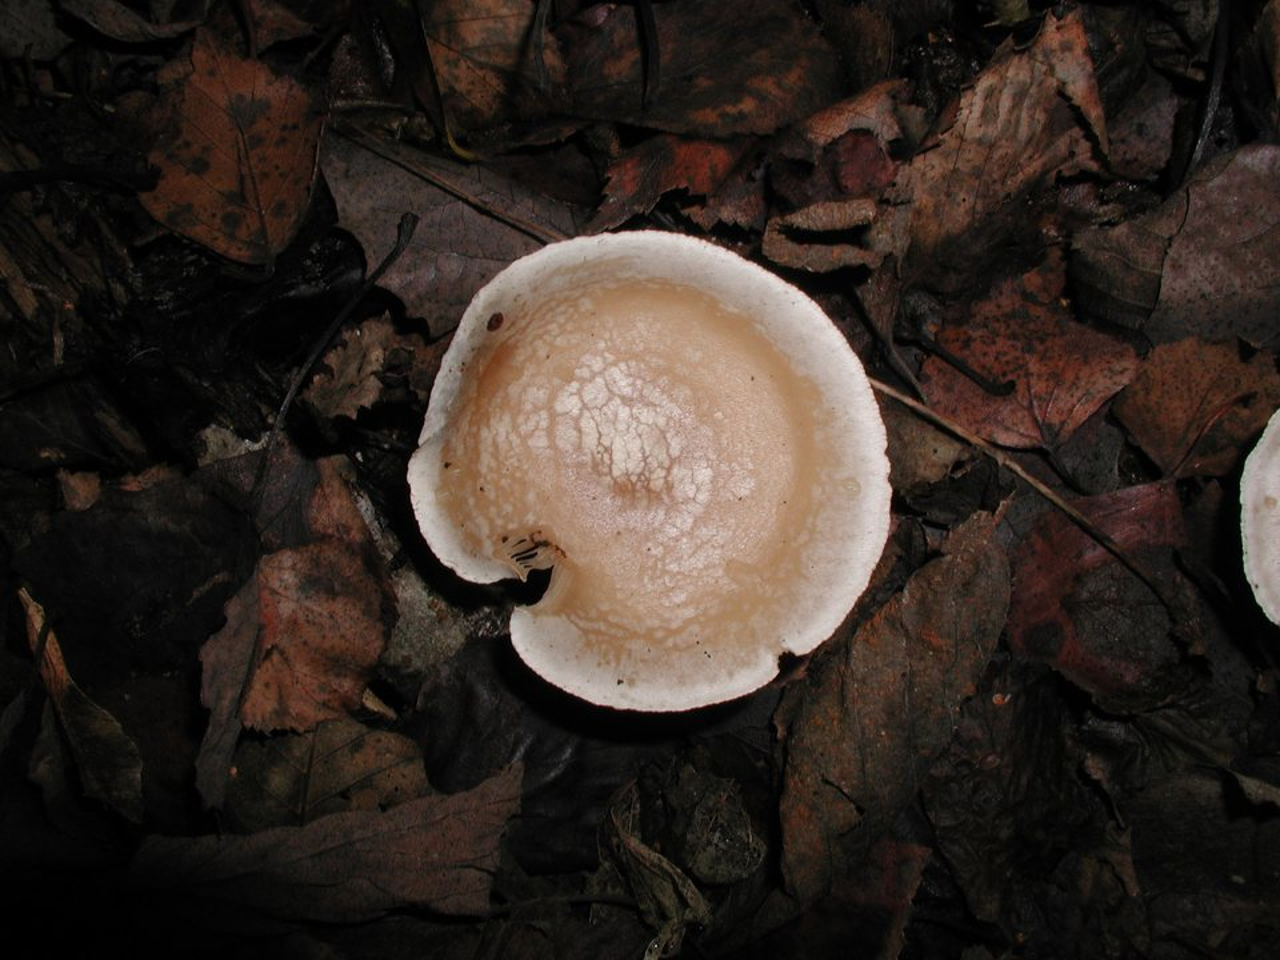 Clitocybe-tornata-PB180117.jpg